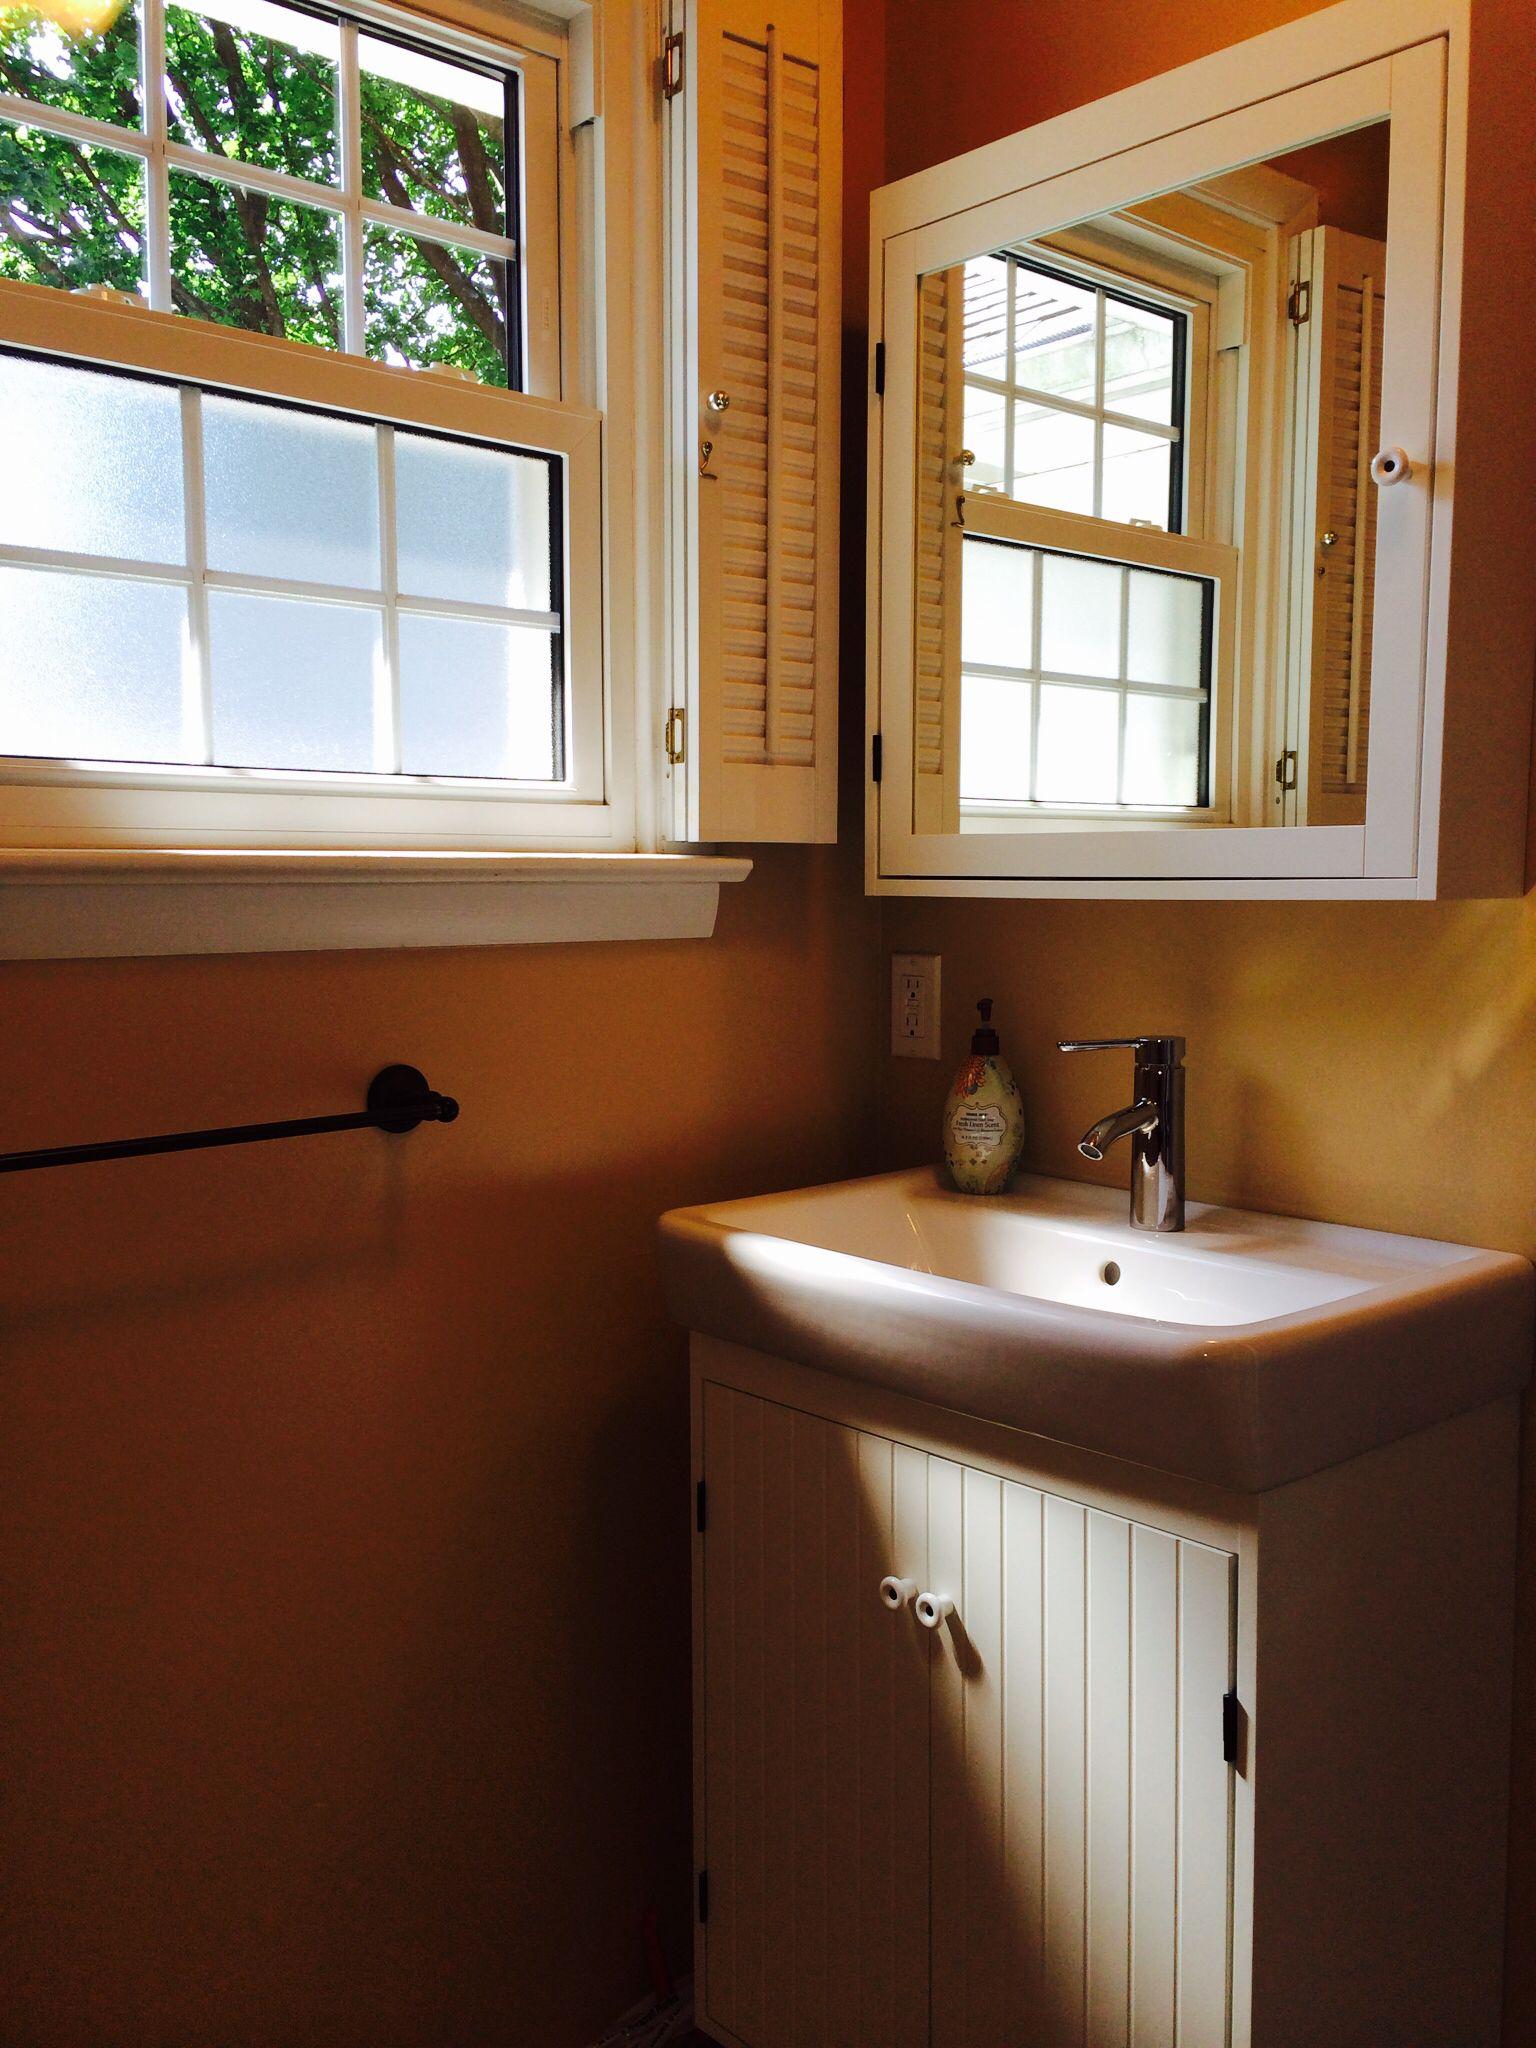 Ikea Bathroom Hamnviken Sink Silveran Sink Cabinet Dalskar Faucet Silveran Mirror Cabinet